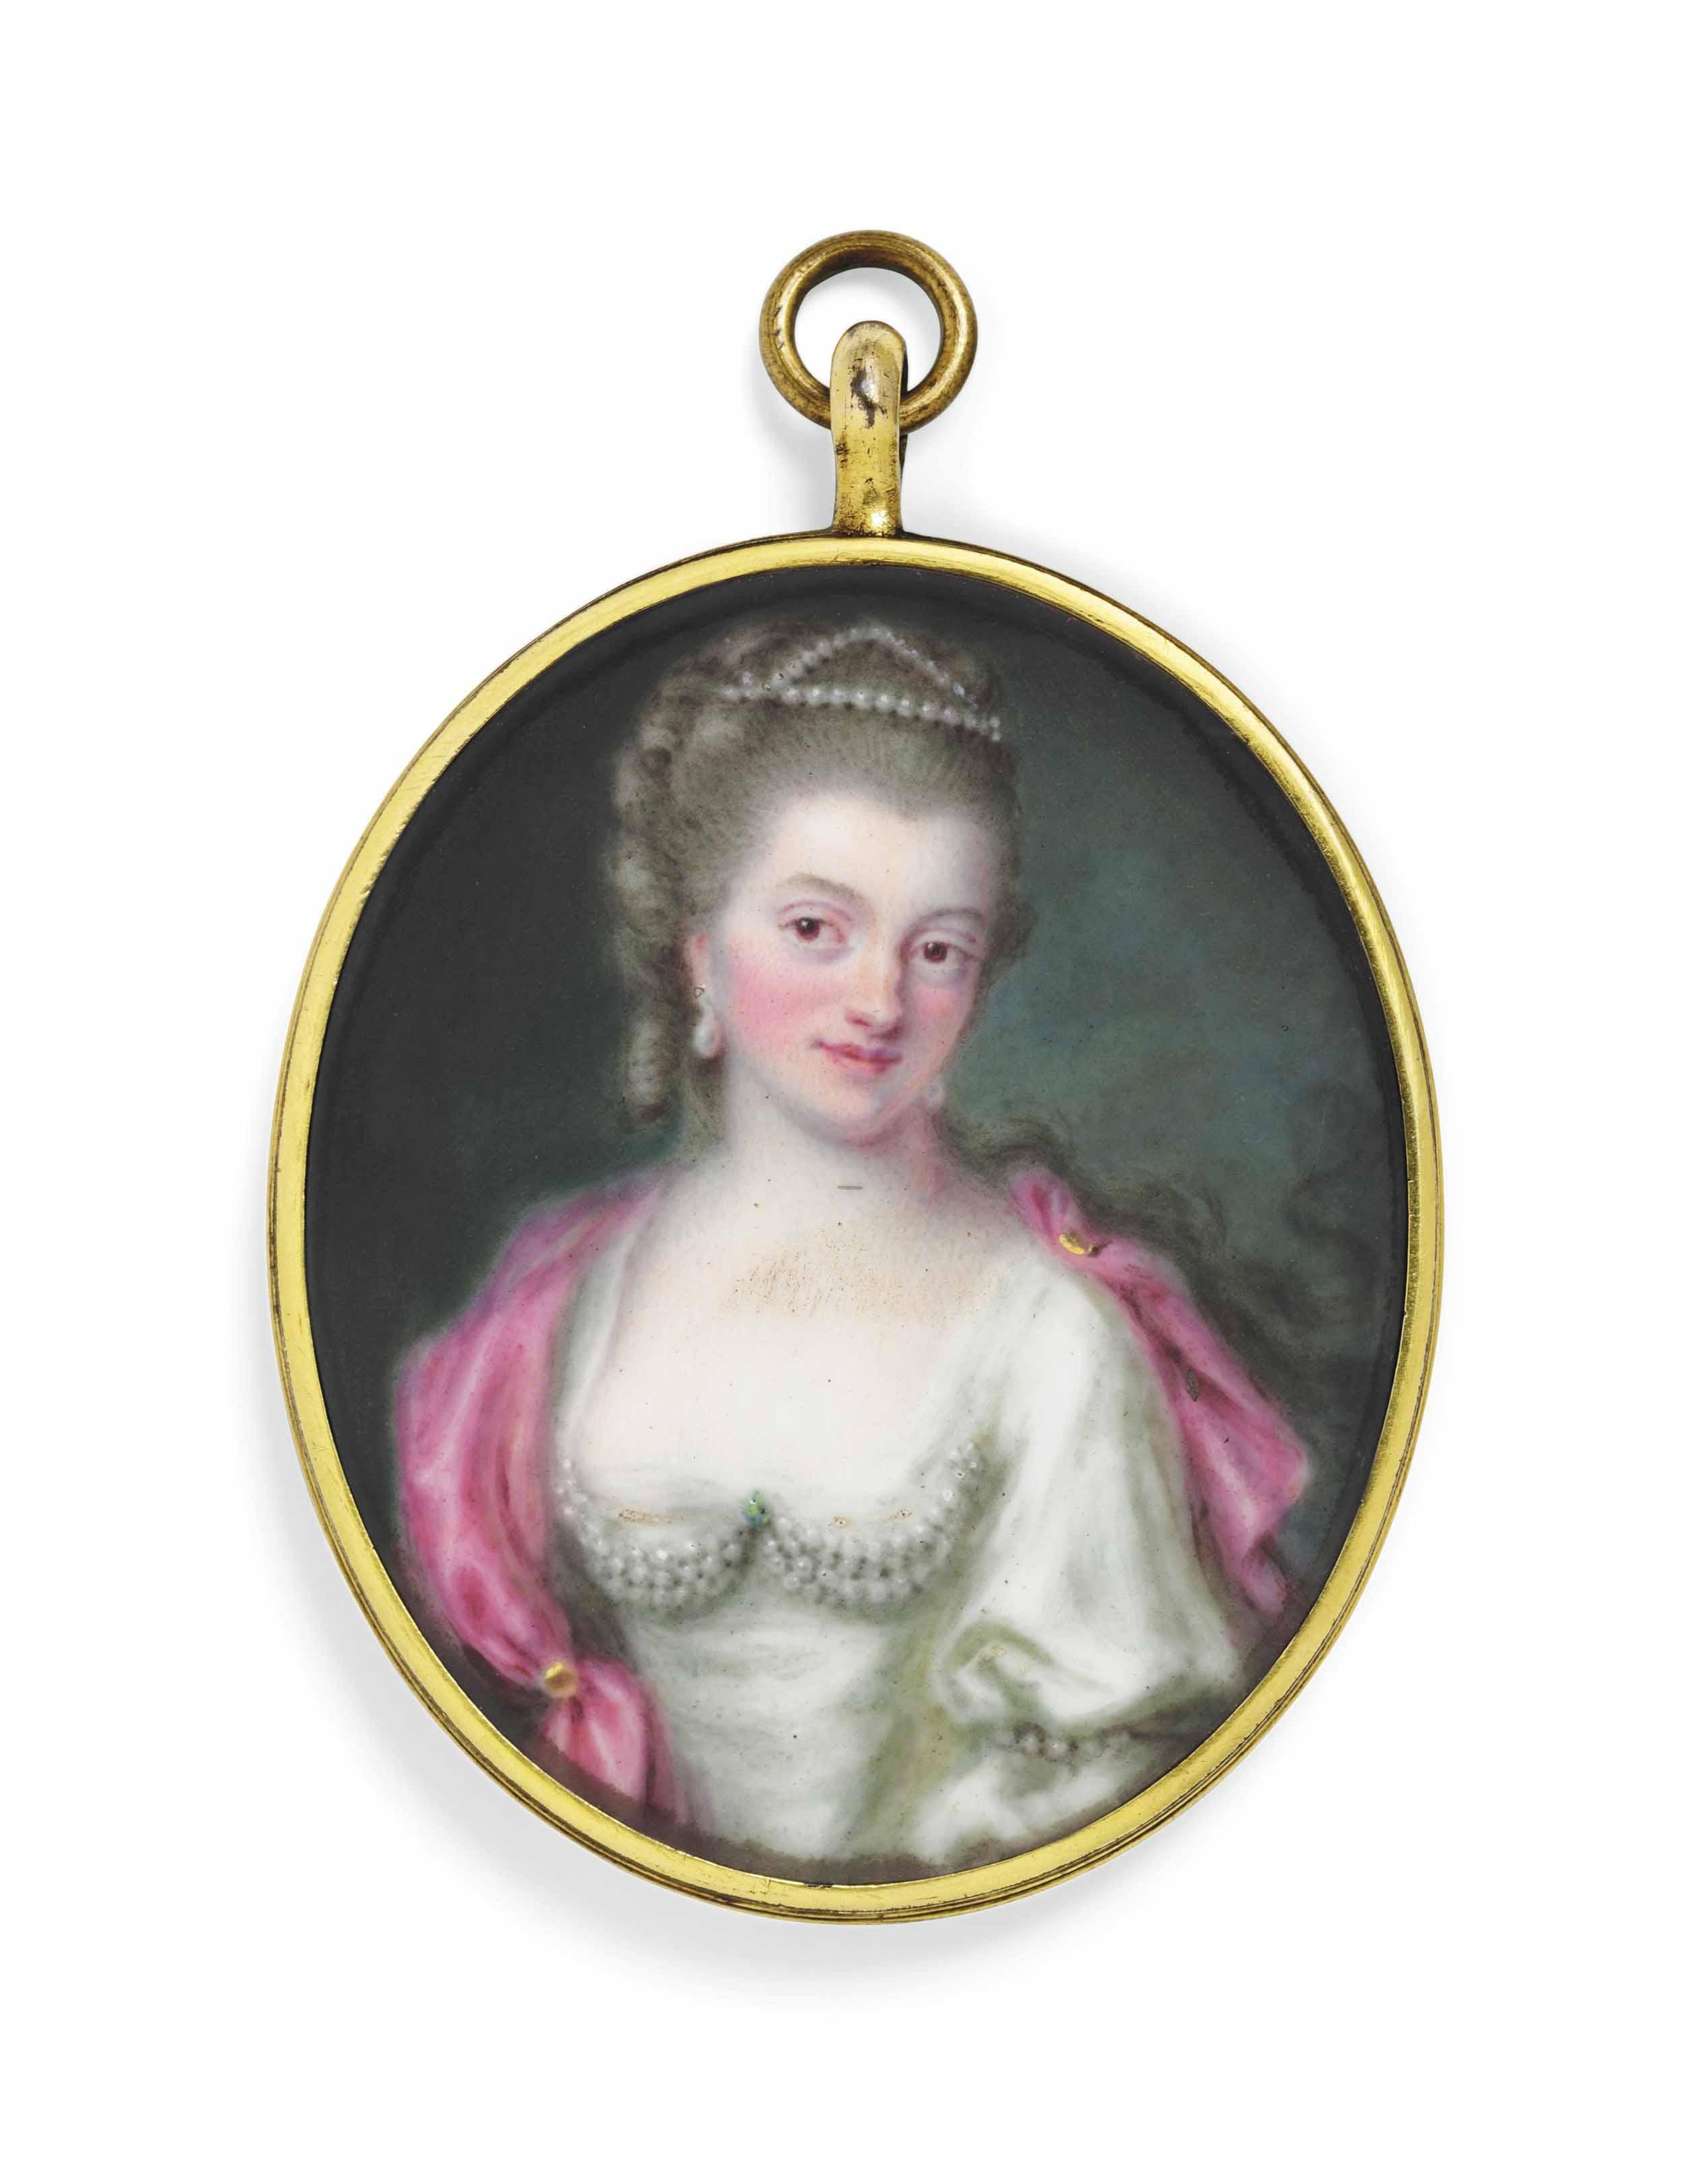 PIERRE PASQUIER (FRENCH, 1731-